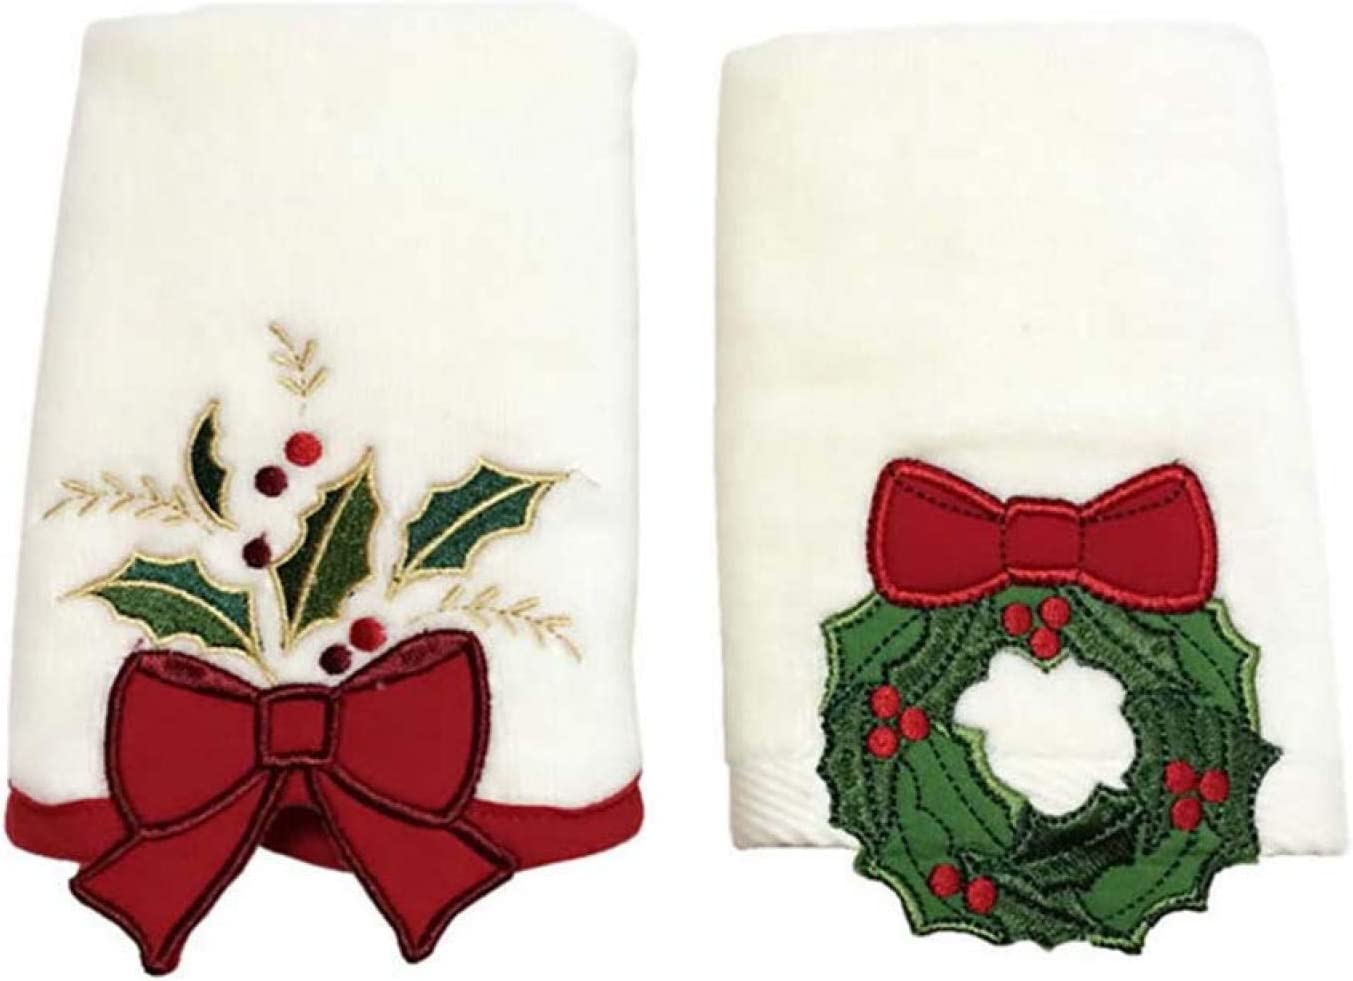 CALIDAKA 2 Pcs/3 Pcs Kids Christmas Hand Towels, Cotton Bathroom Washcloths, Wash Basin Towels Christmas Face Towel Decor, Christmas Towels Gift Set, 14.96 x 23.62 Inch